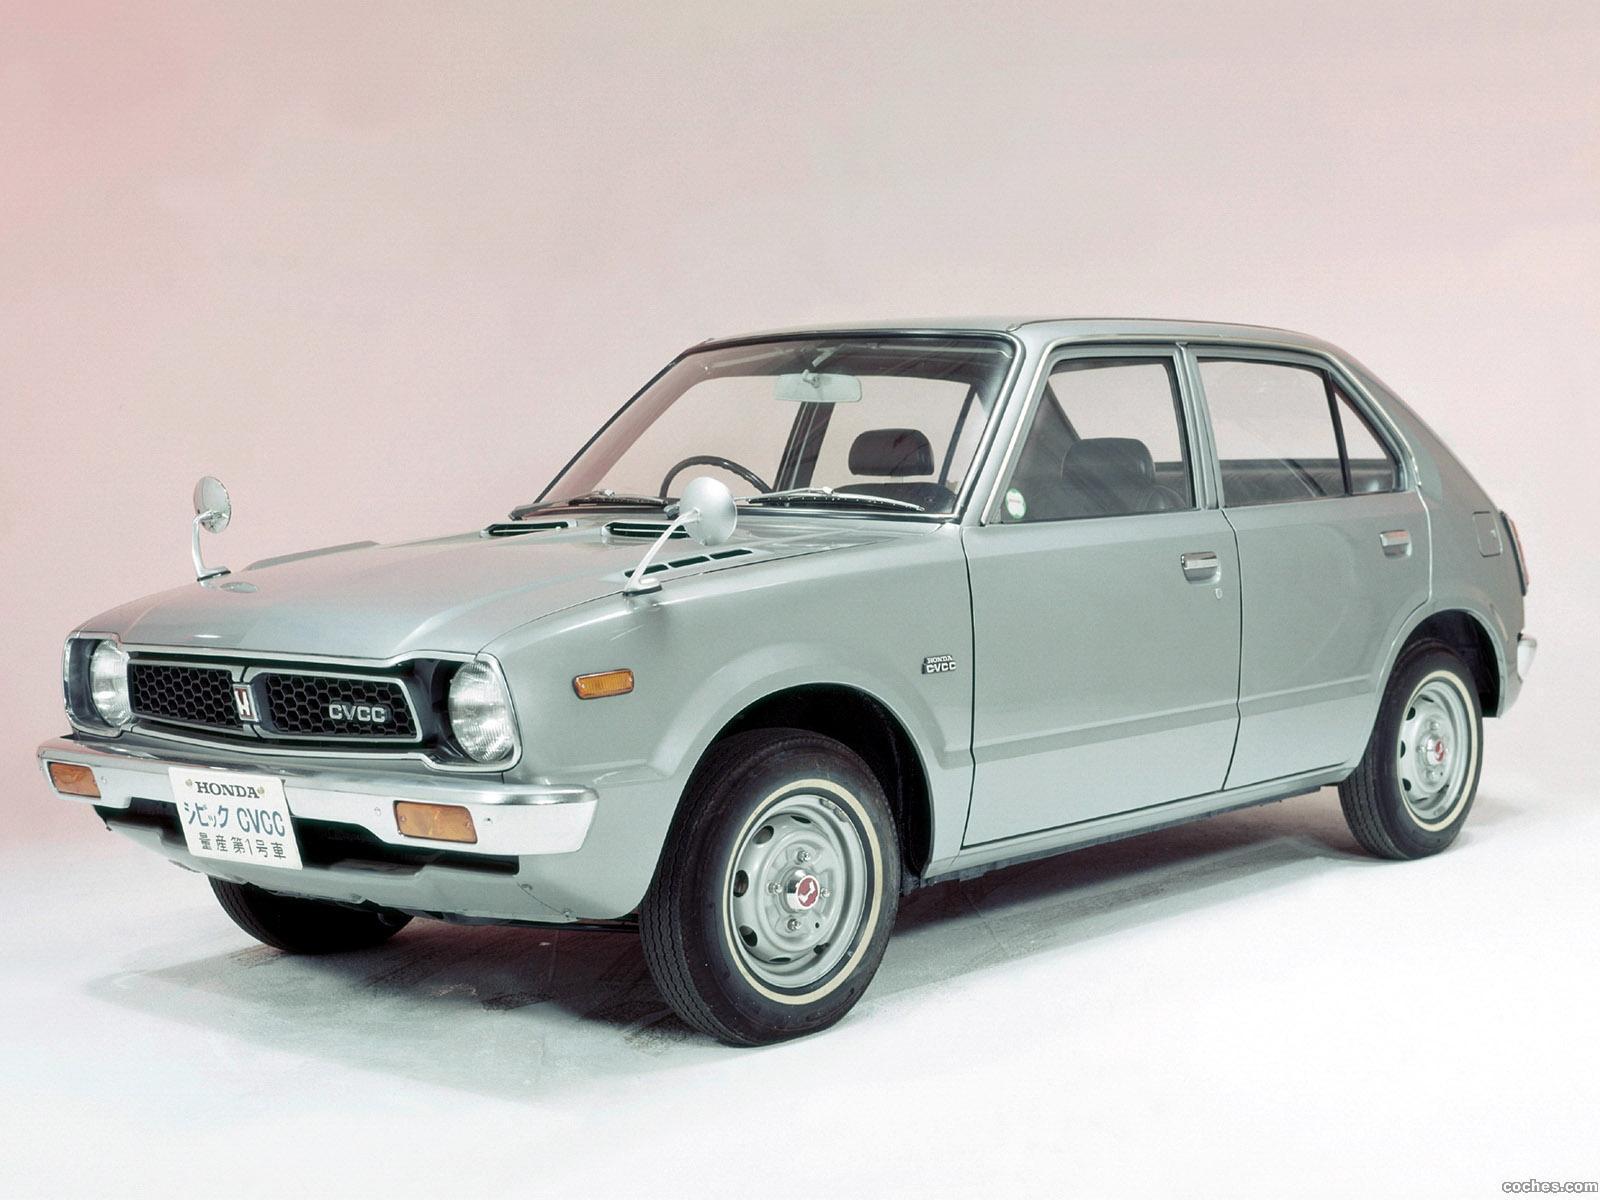 Foto 0 de Honda Civic 5 door 1972